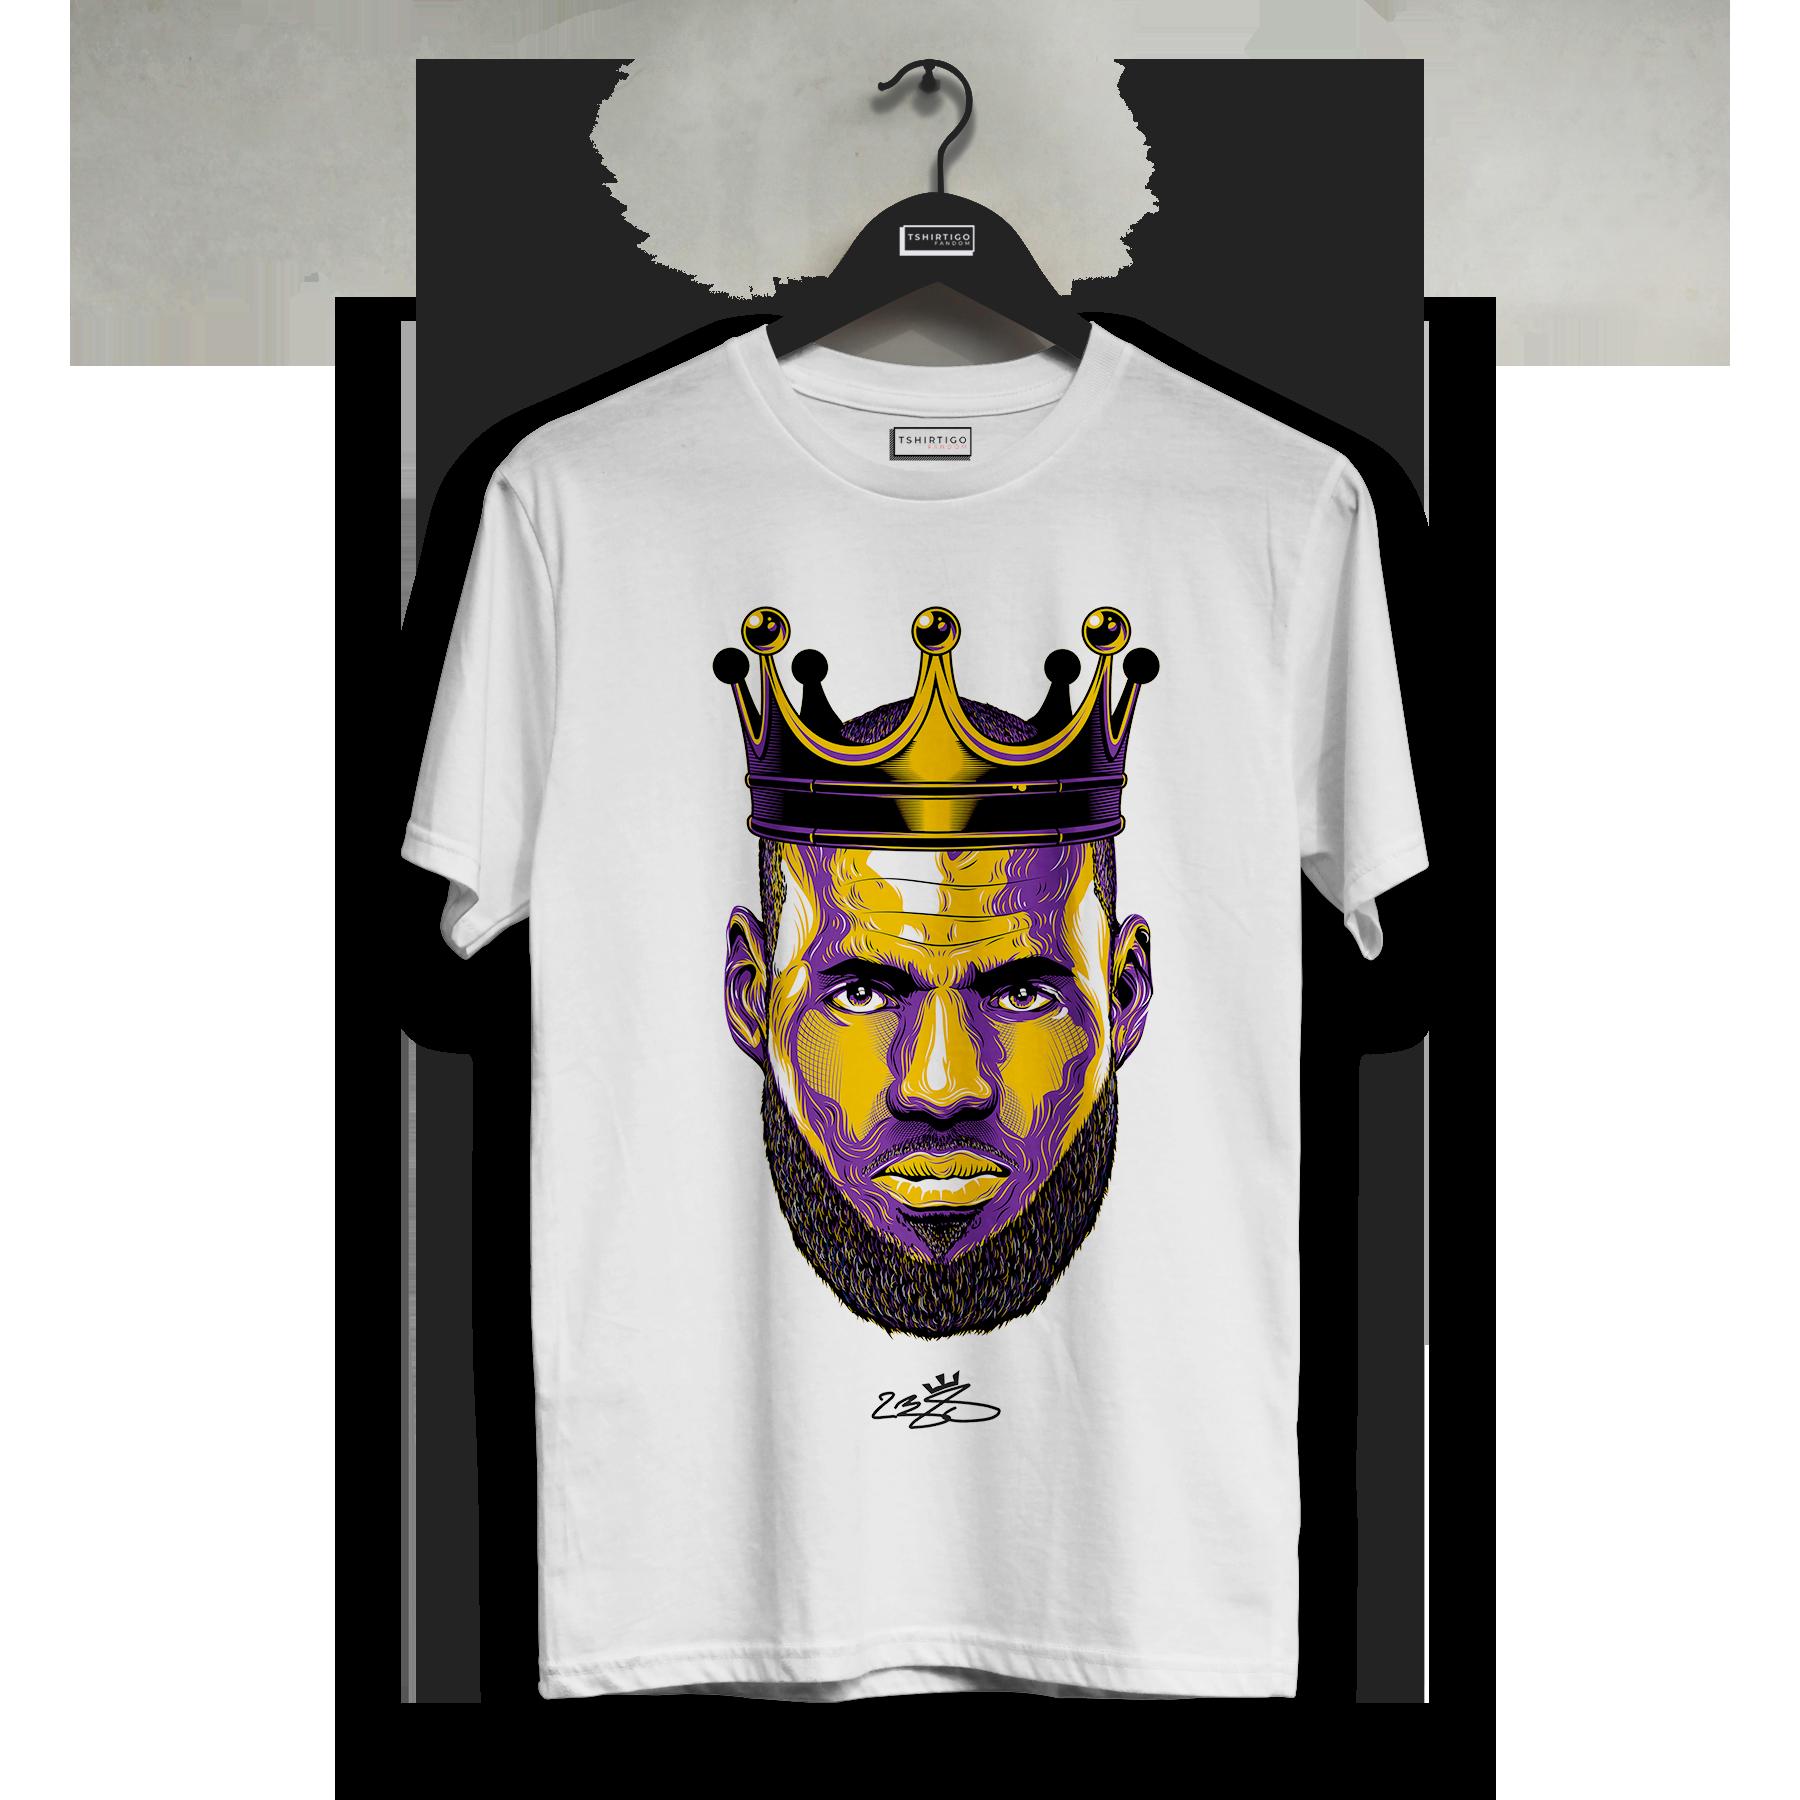 Футболка с надписью «Lakers LeBron James Crown of a King» футболка с принтом «Lebron James» баскетбольная футболка «NBA Lakers» в подарок Спортивная белая футболка